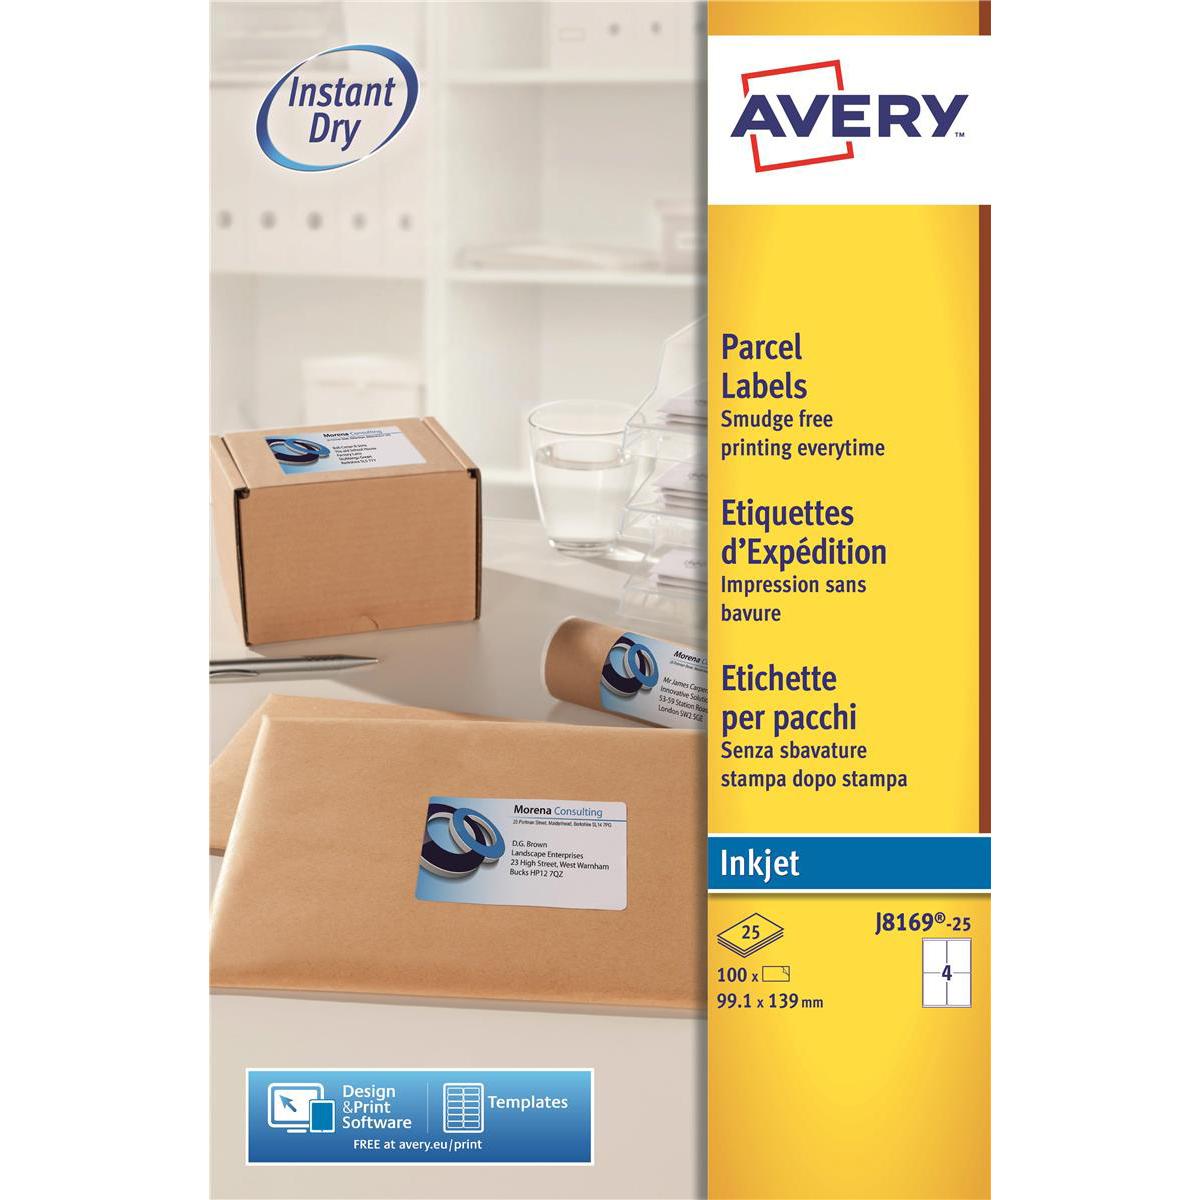 avery quick dry parcel labels inkjet 4 per sheet 139x99 1mm white